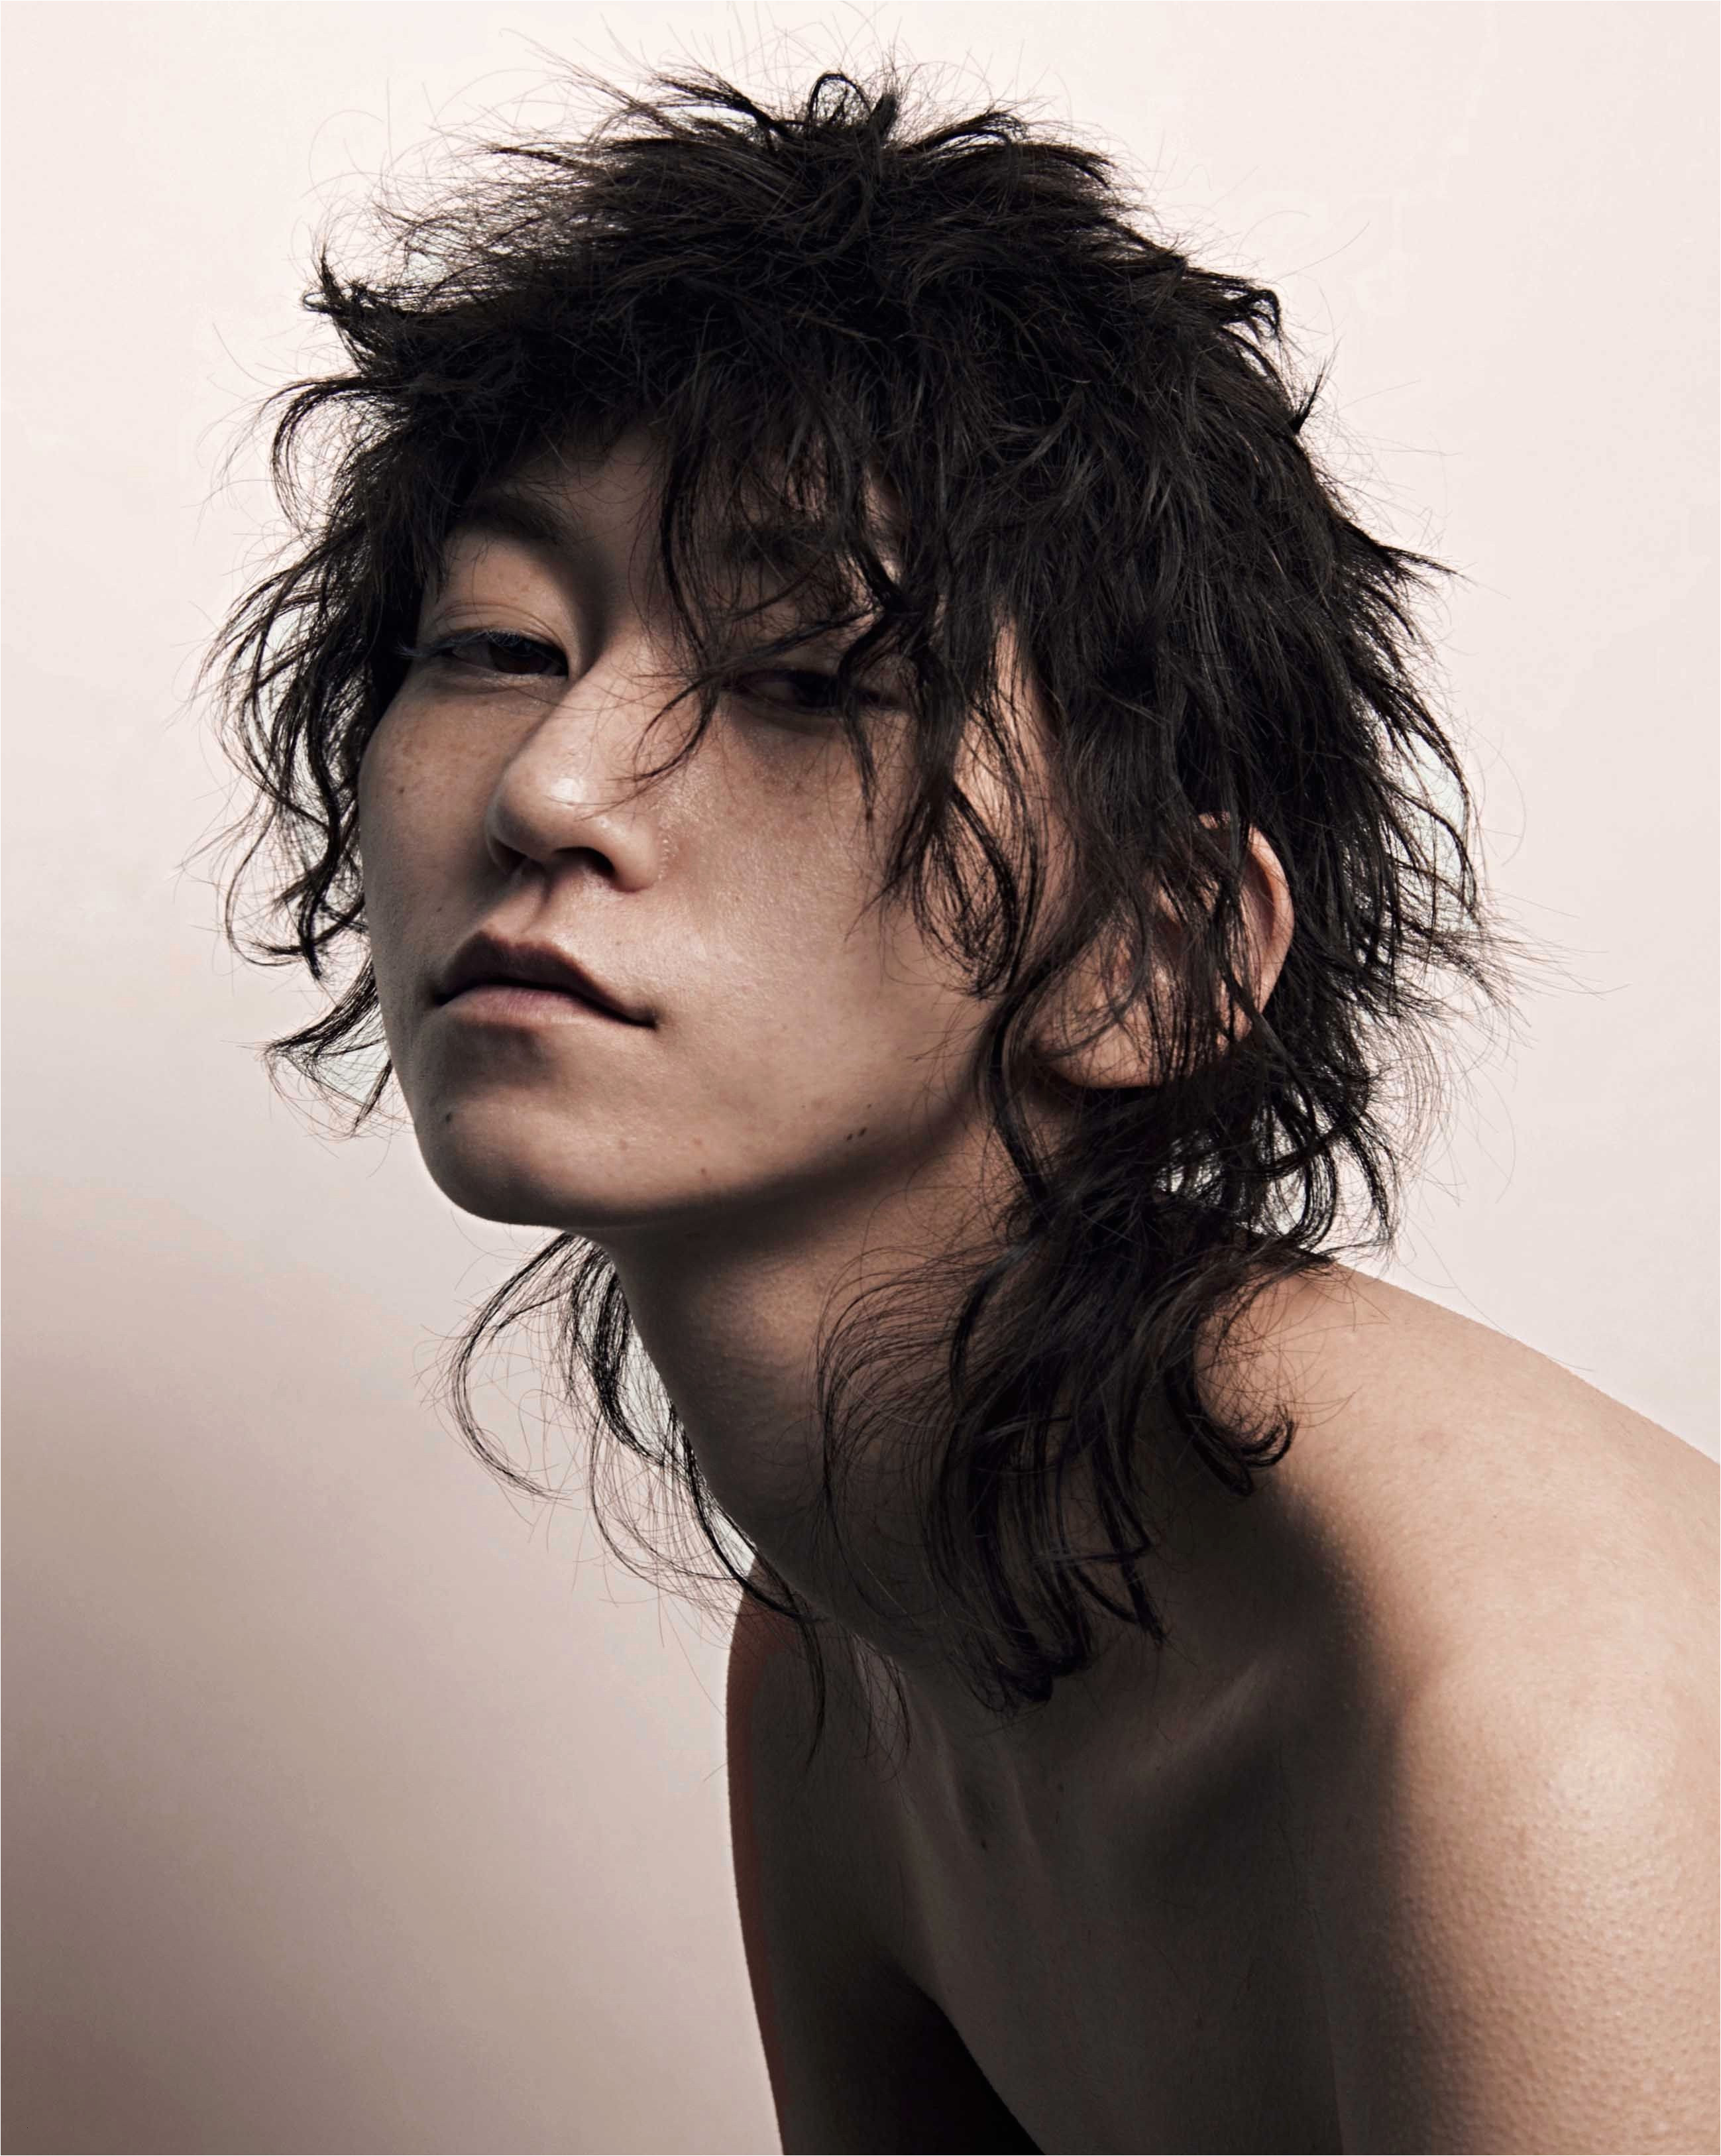 Short Asian Hair Styles Luxury Captivating Short Hairstyles For Men New Hairstyles Men 0d Bright